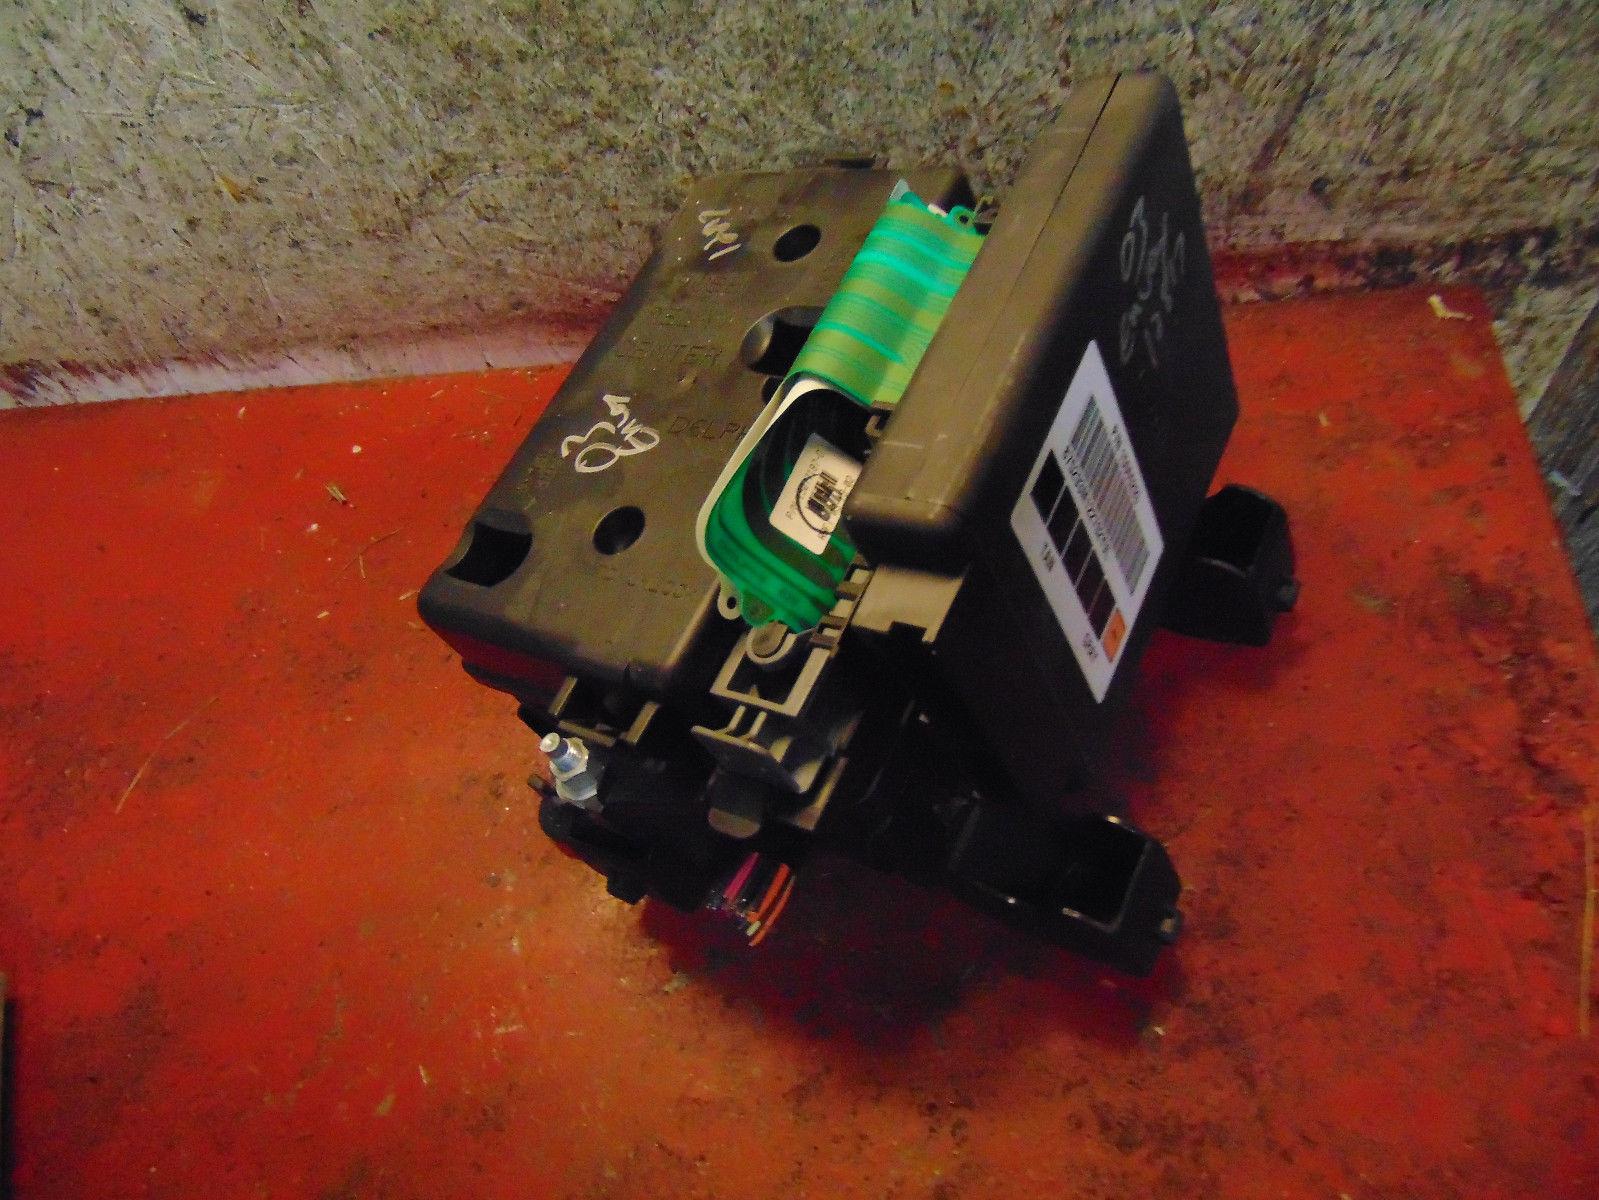 hight resolution of 02 05 04 03 gmc envoy trailblazer fuse box and 17 similar items s l1600